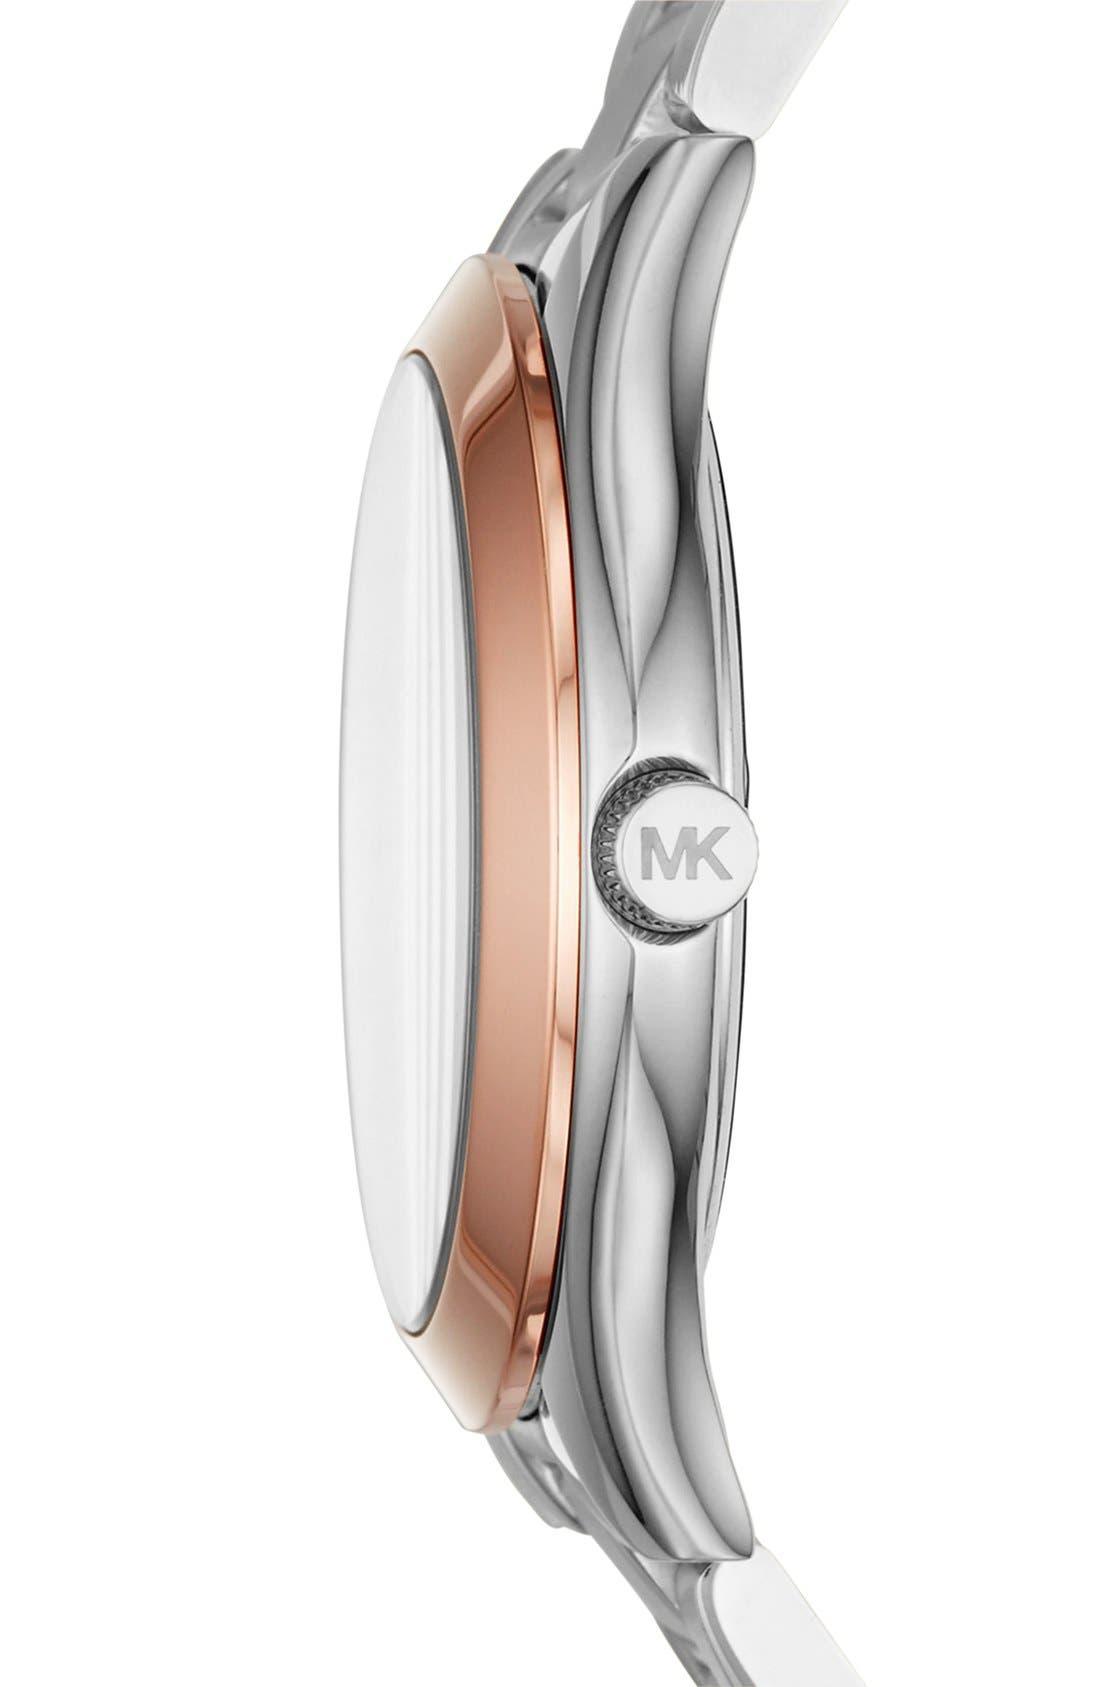 MICHAEL KORS,                             'Slim Runway' Bracelet Watch, 33mm,                             Alternate thumbnail 2, color,                             040